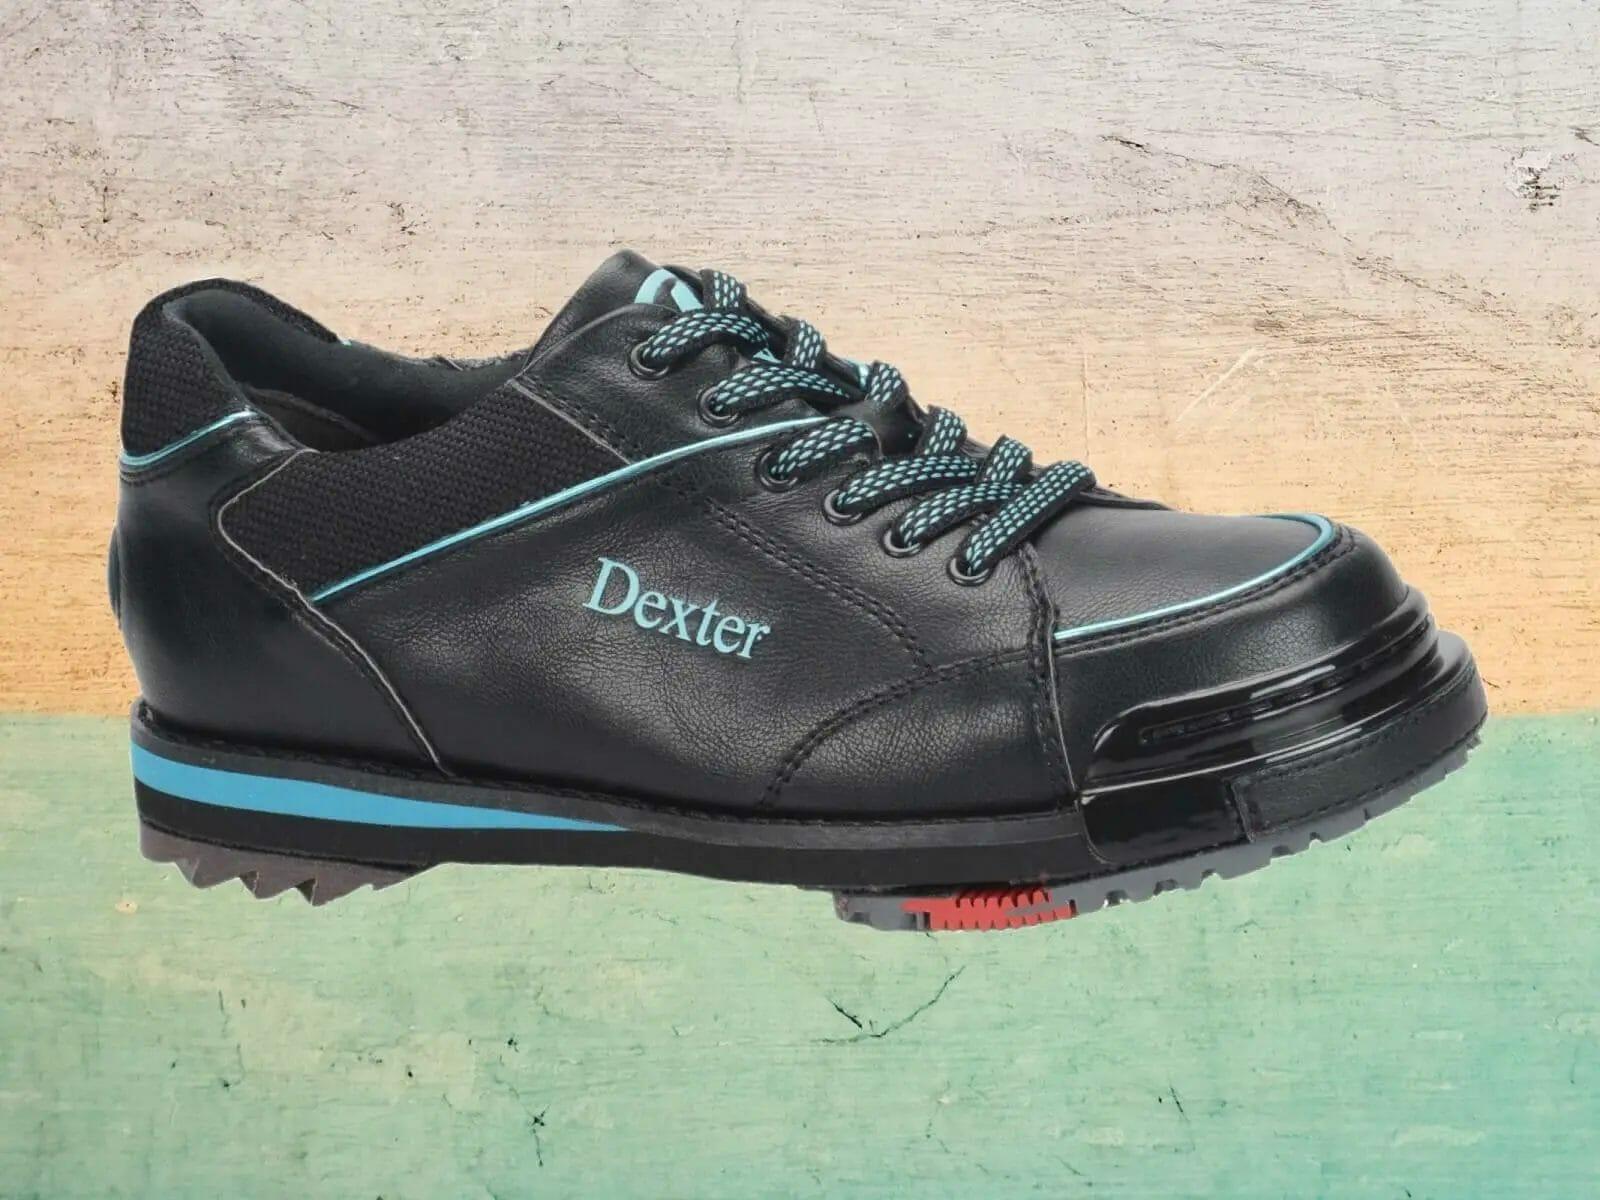 Profile of Dexter SST 8 Professional bowling shoe